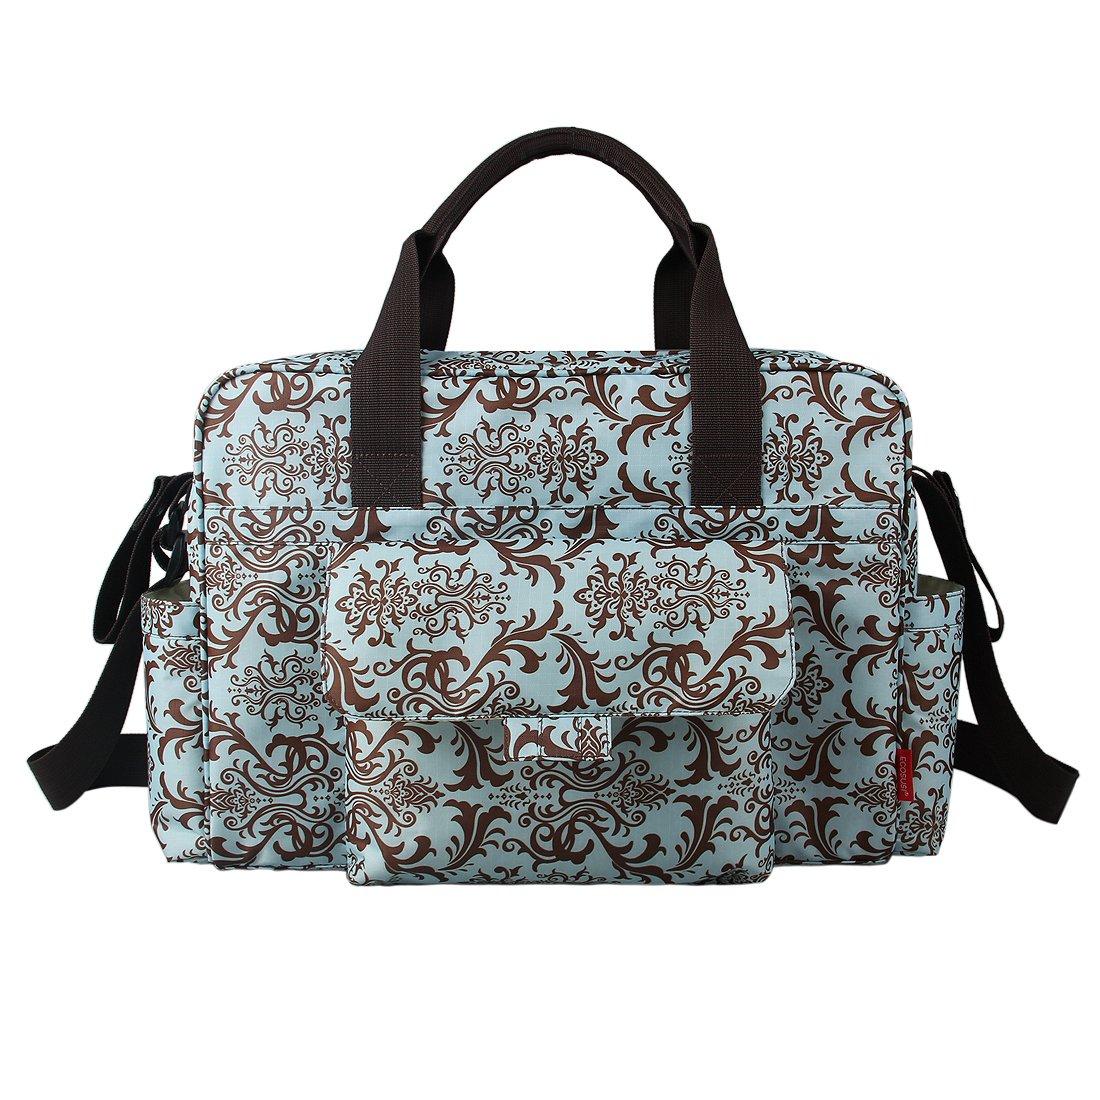 Ecosusi Diaper Tote Bags $37 (...